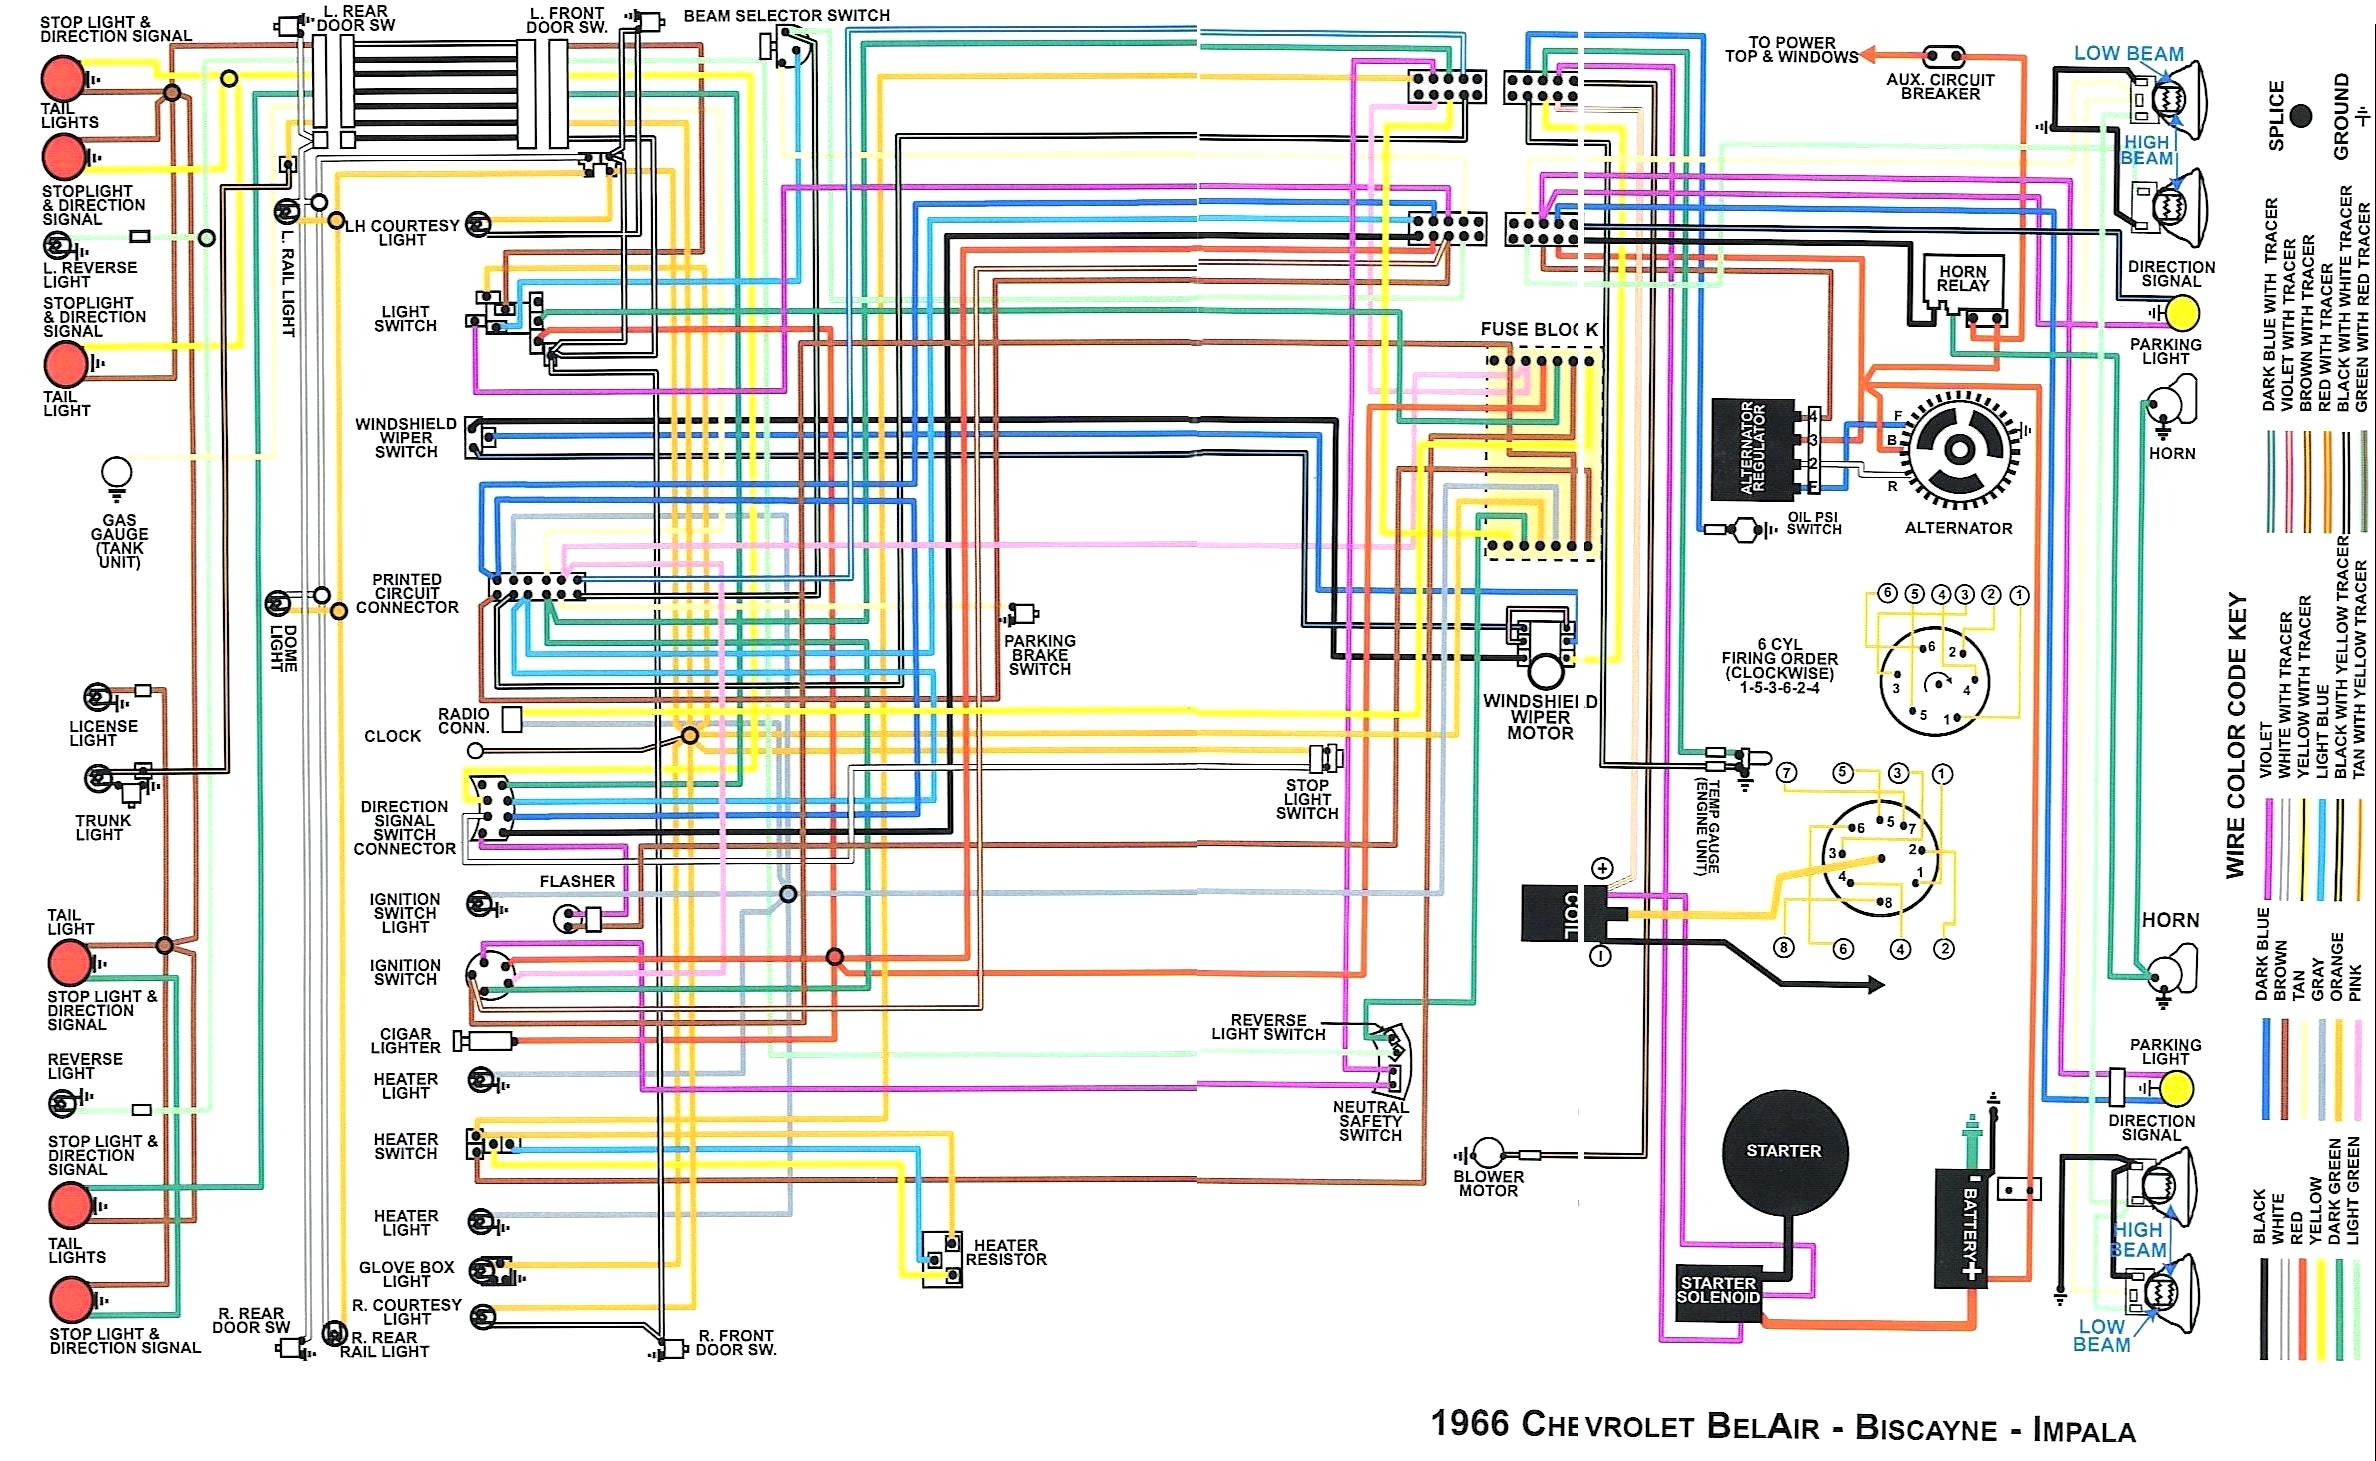 1966 1965 Impala Wiring Diagram - Hydro Pro Pool Pump Wiring Diagram List  Data Schematicbig-data-2.artisticocatalano.it